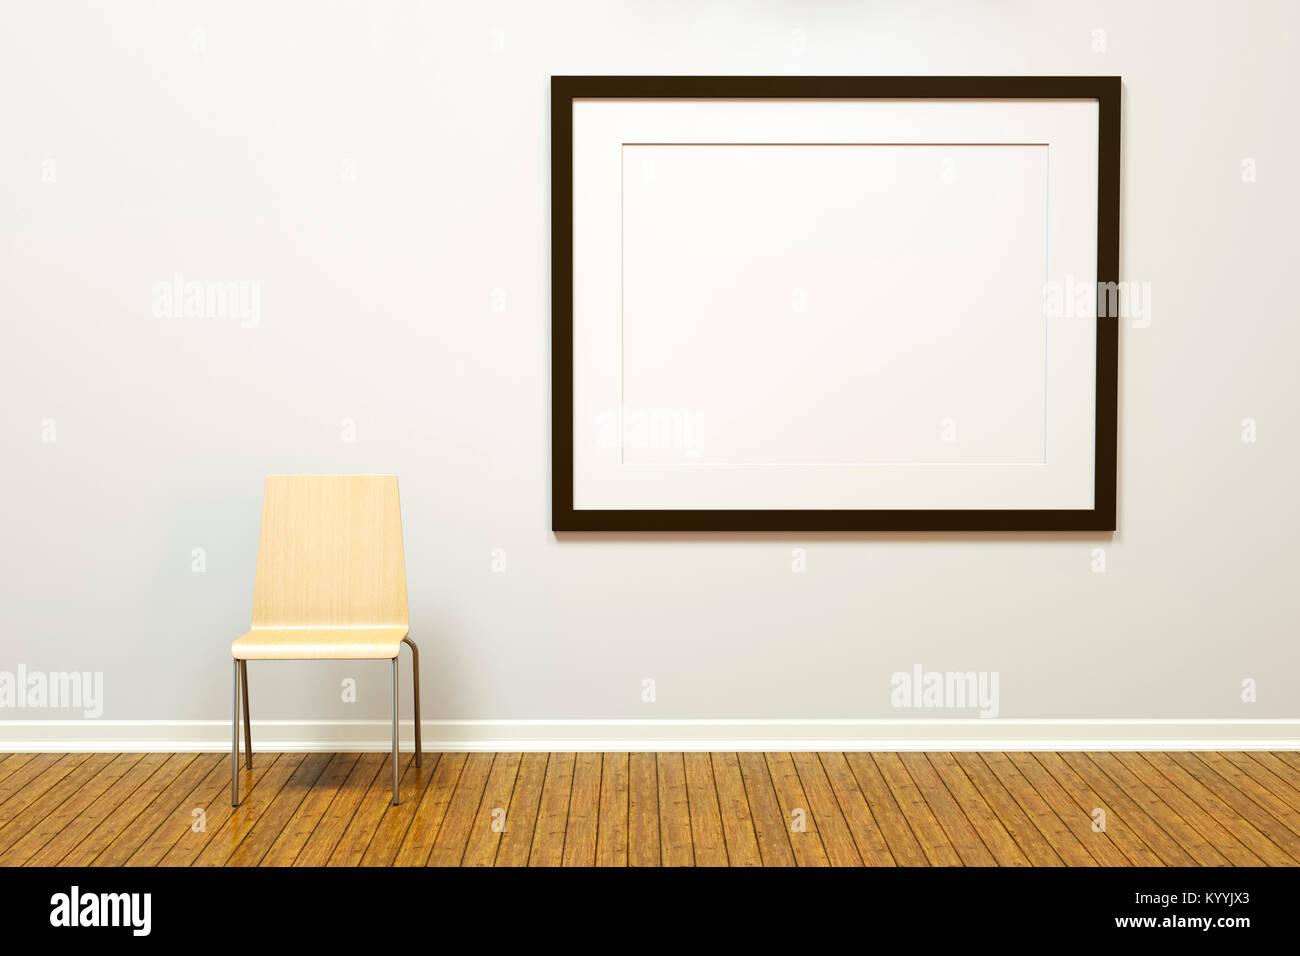 Große leere horizontale Bilderrahmen in der Art Gallery an einer ...